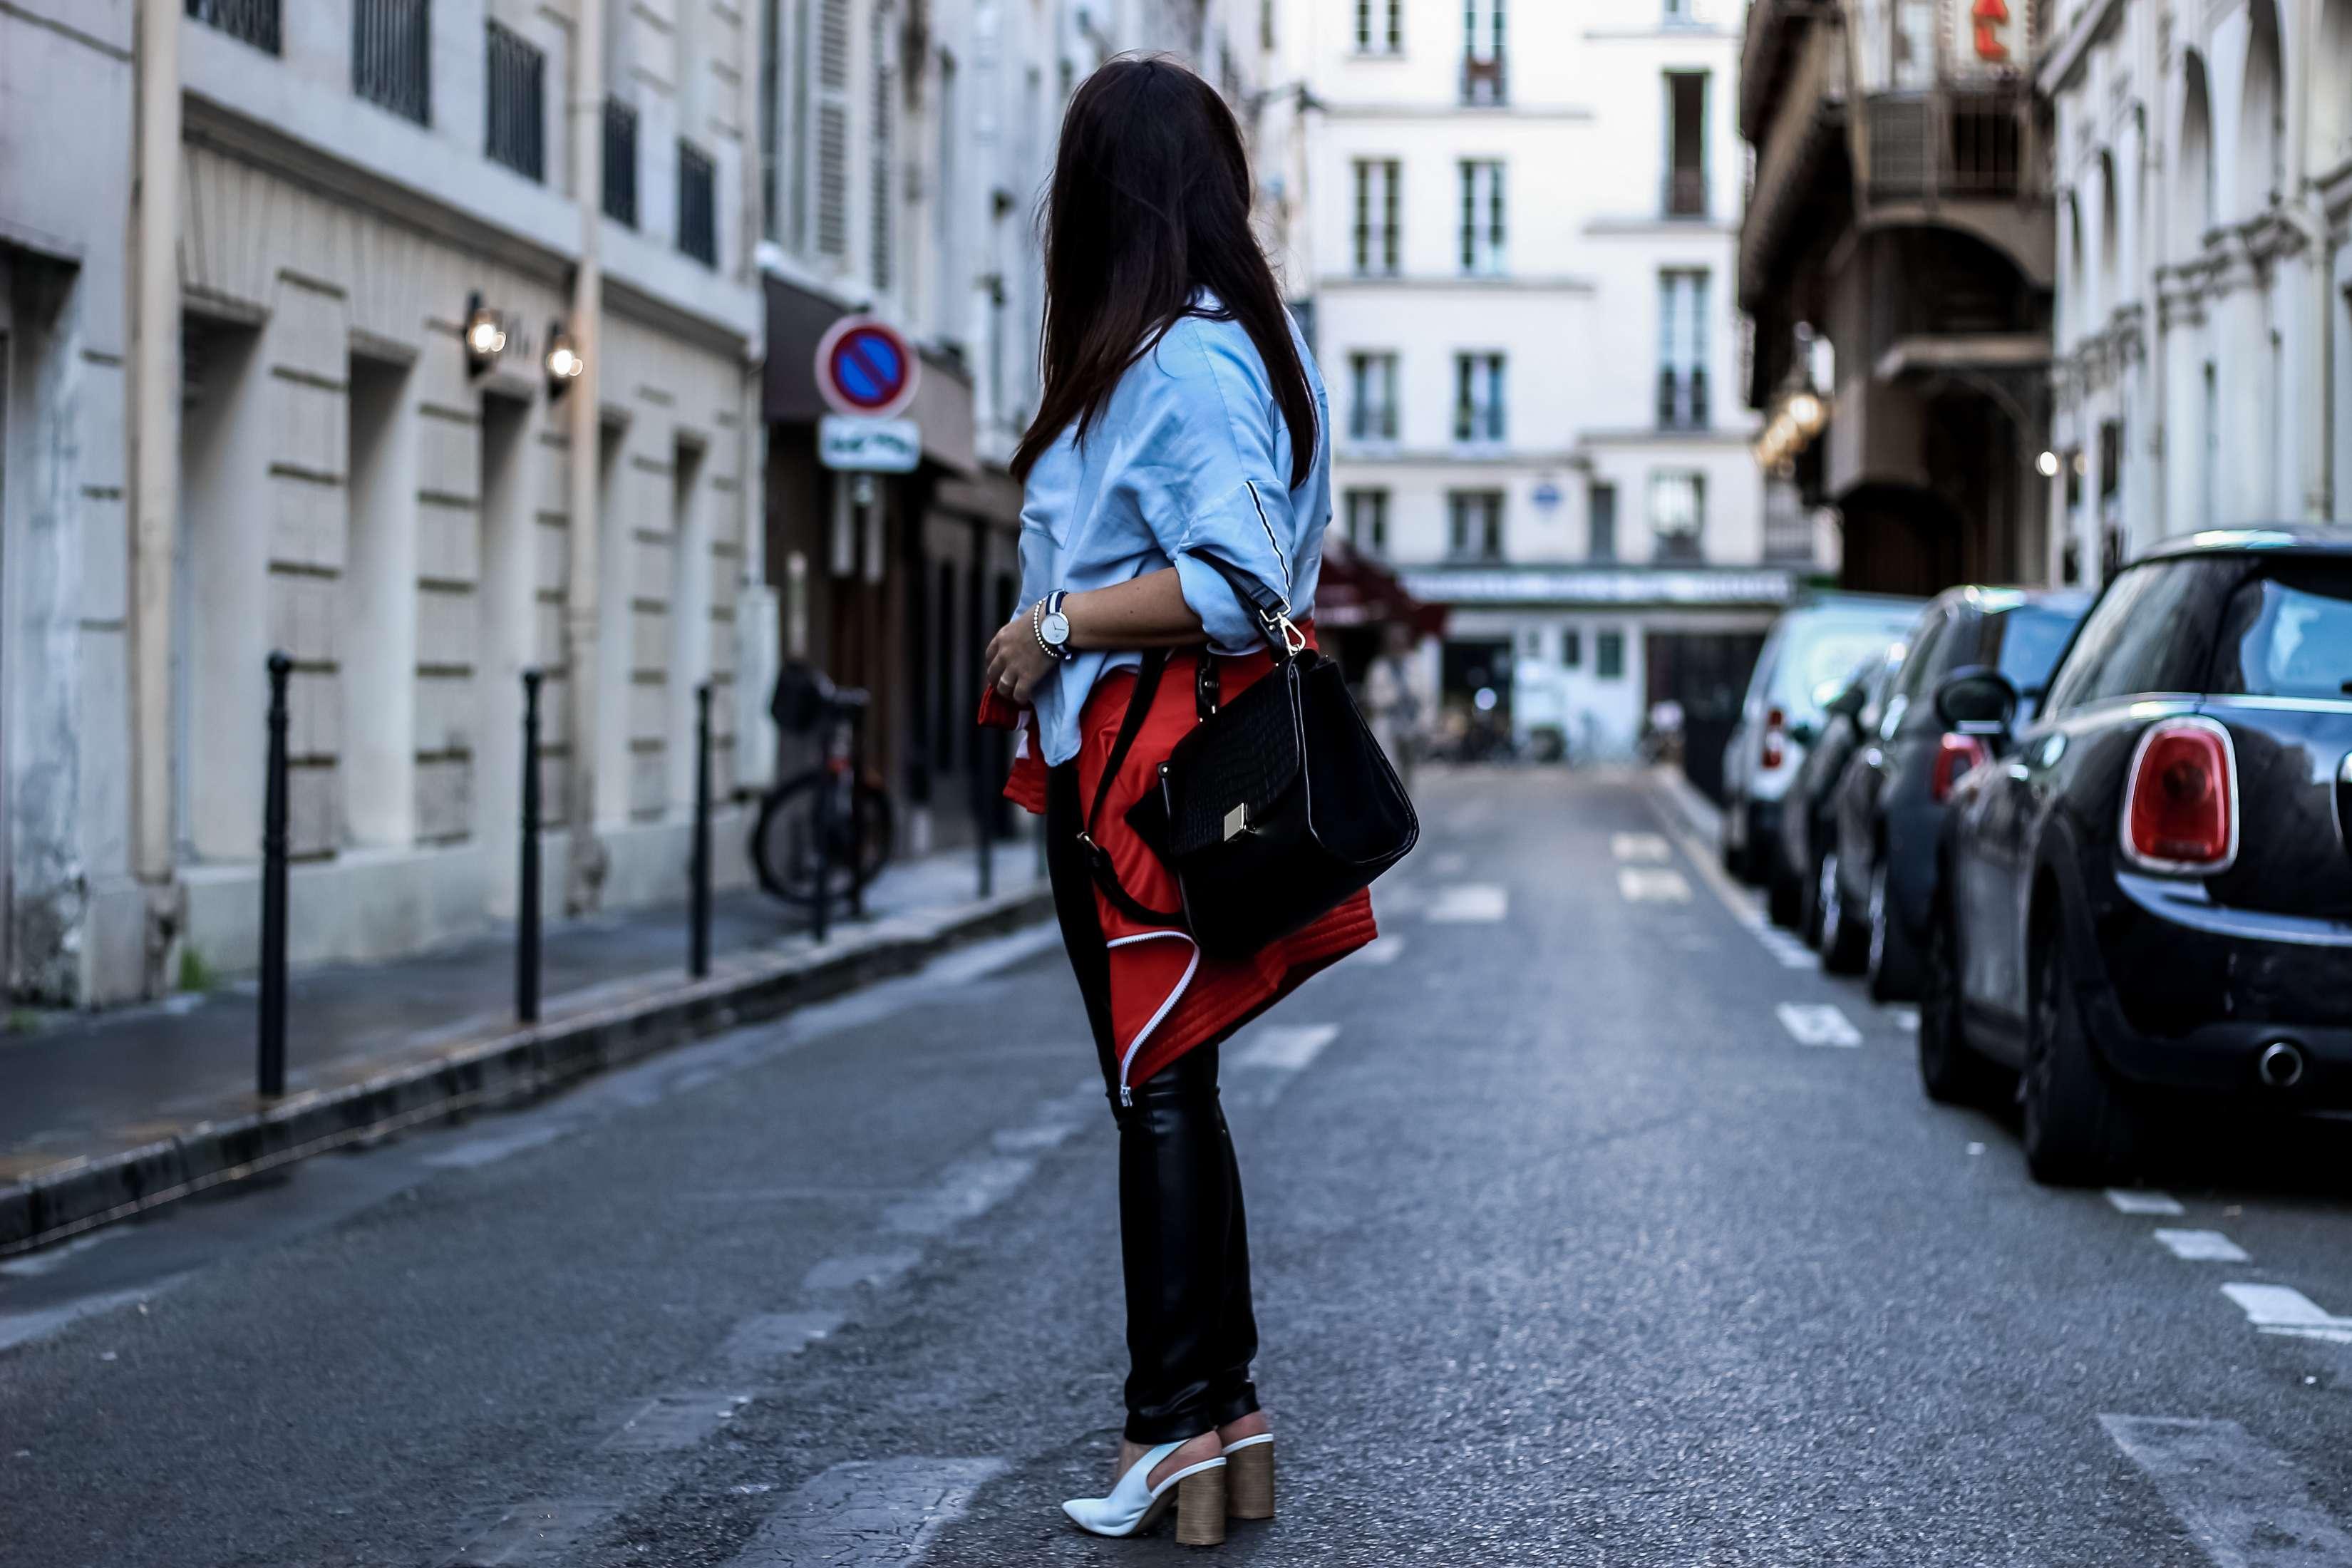 sportwear, hm, the green ananas, blog mode, zara, chemise bleu, escarpins blancs, sac inspi celine sac trapeze, ali express, pantalon simili, veste jogging femme